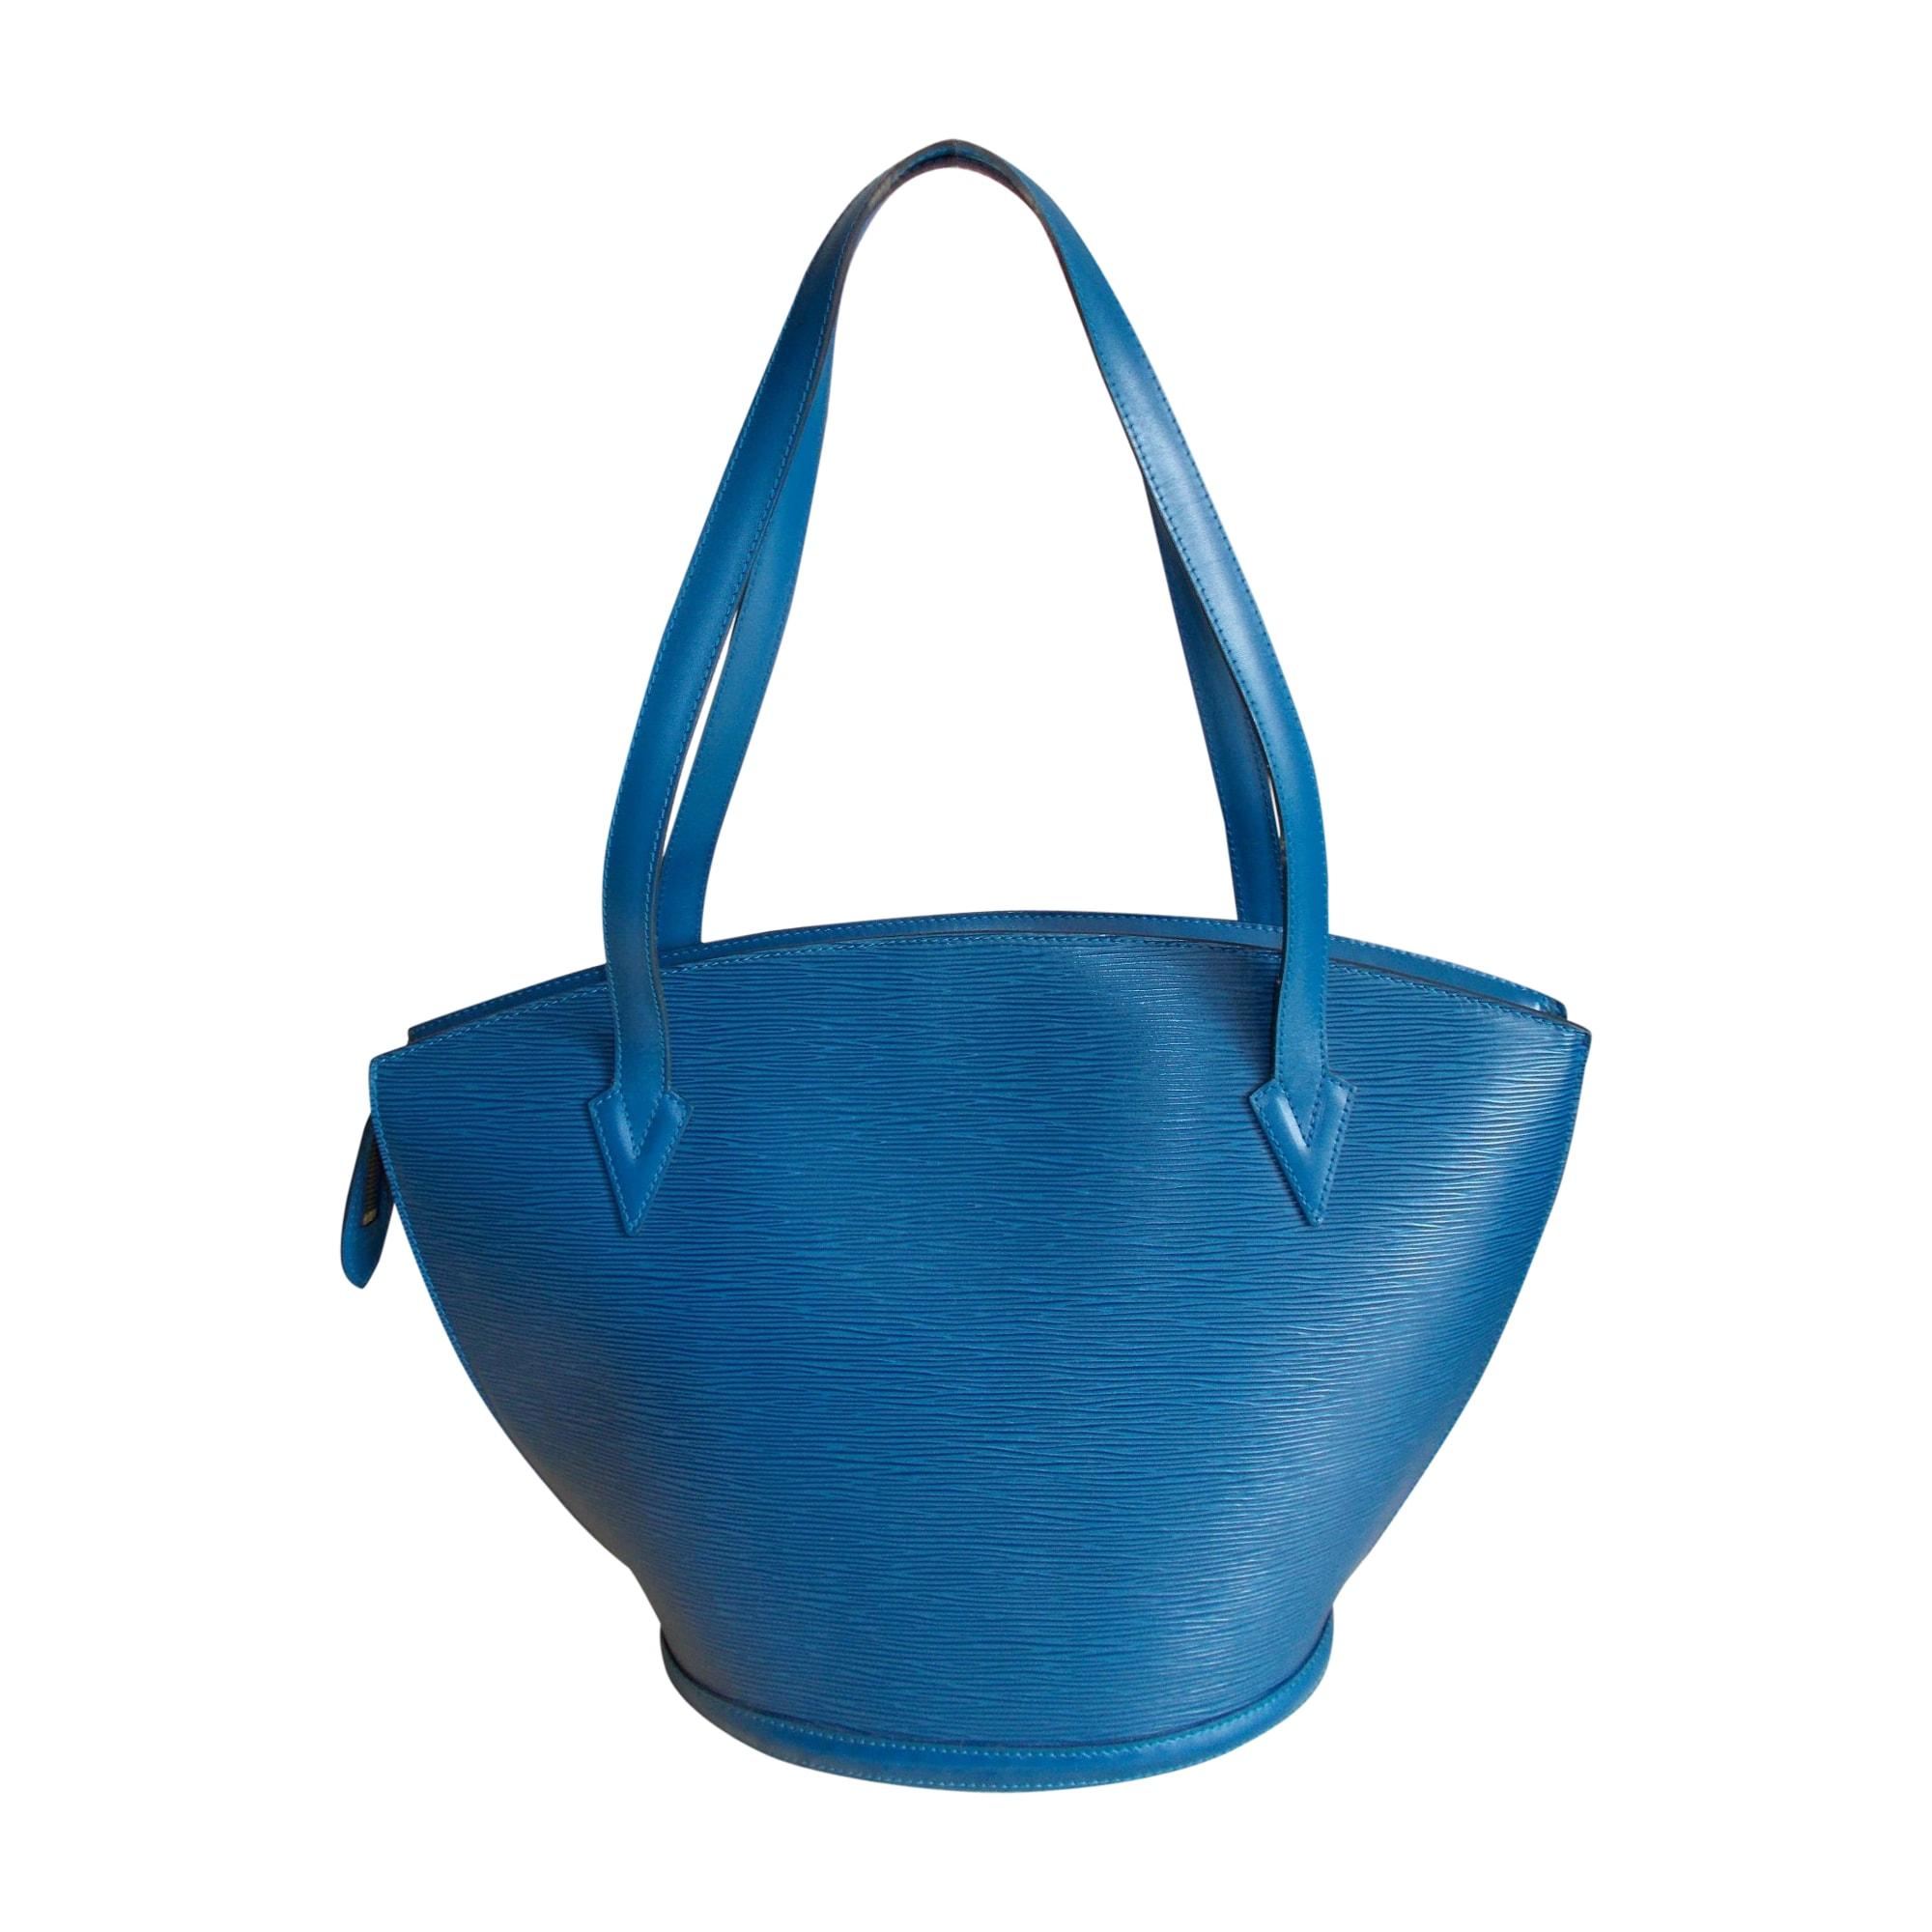 Sac XL en cuir LOUIS VUITTON Bleu, bleu marine, bleu turquoise